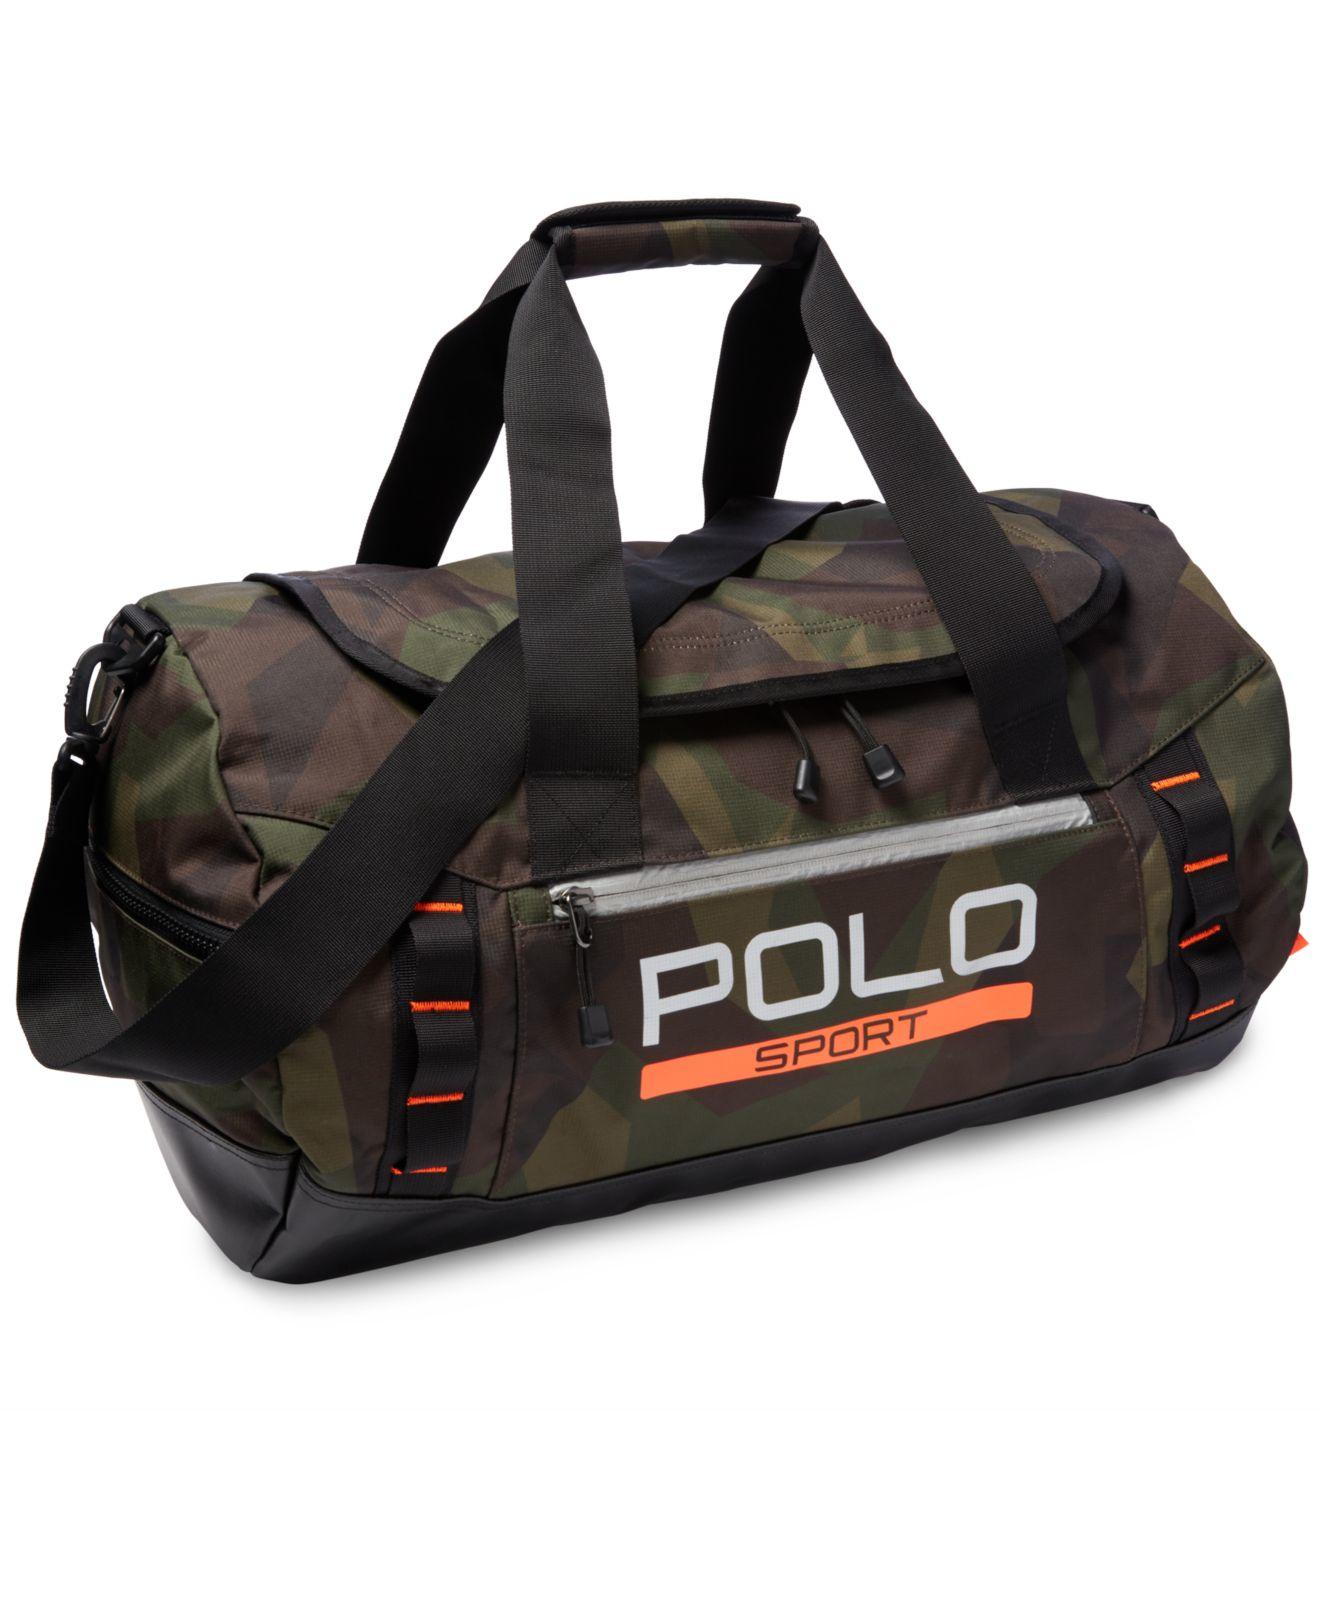 ... discount lyst polo ralph lauren polo sport duffel bag in green for men  b0666 c87c7 b8d90e46dd643